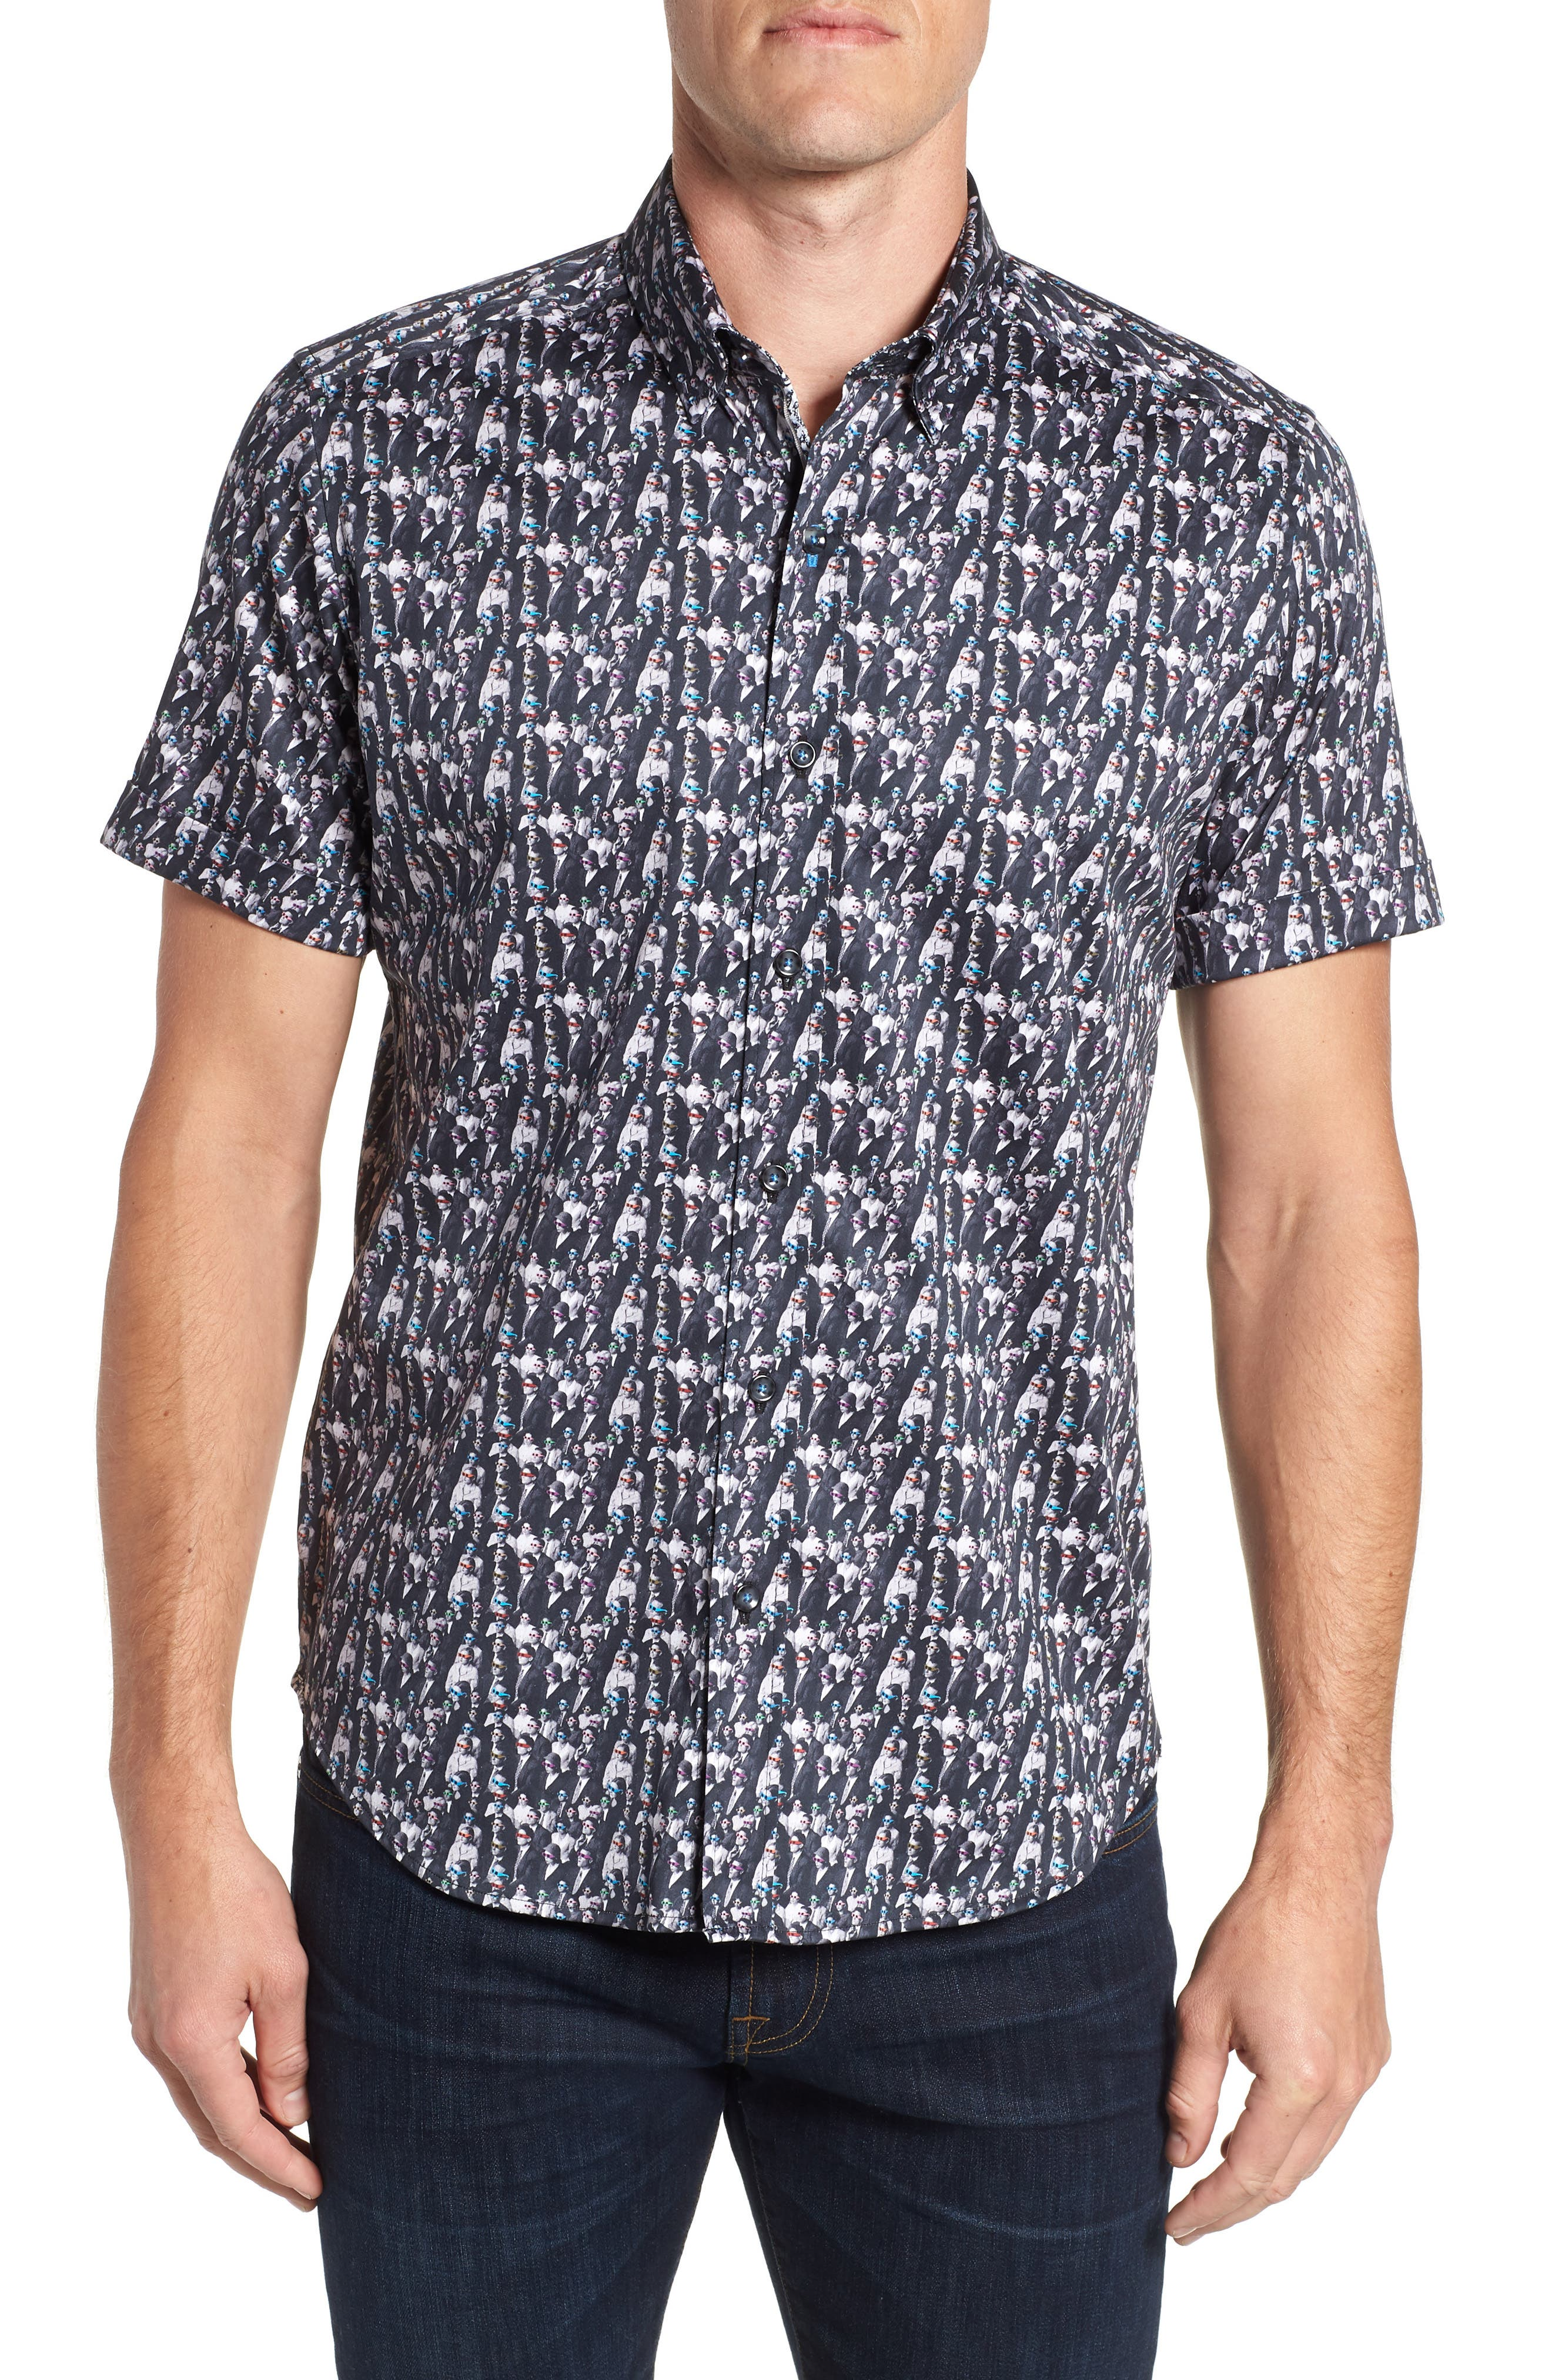 ROBERT GRAHAM Cinema Tailored Fit Sport Shirt, Main, color, 001